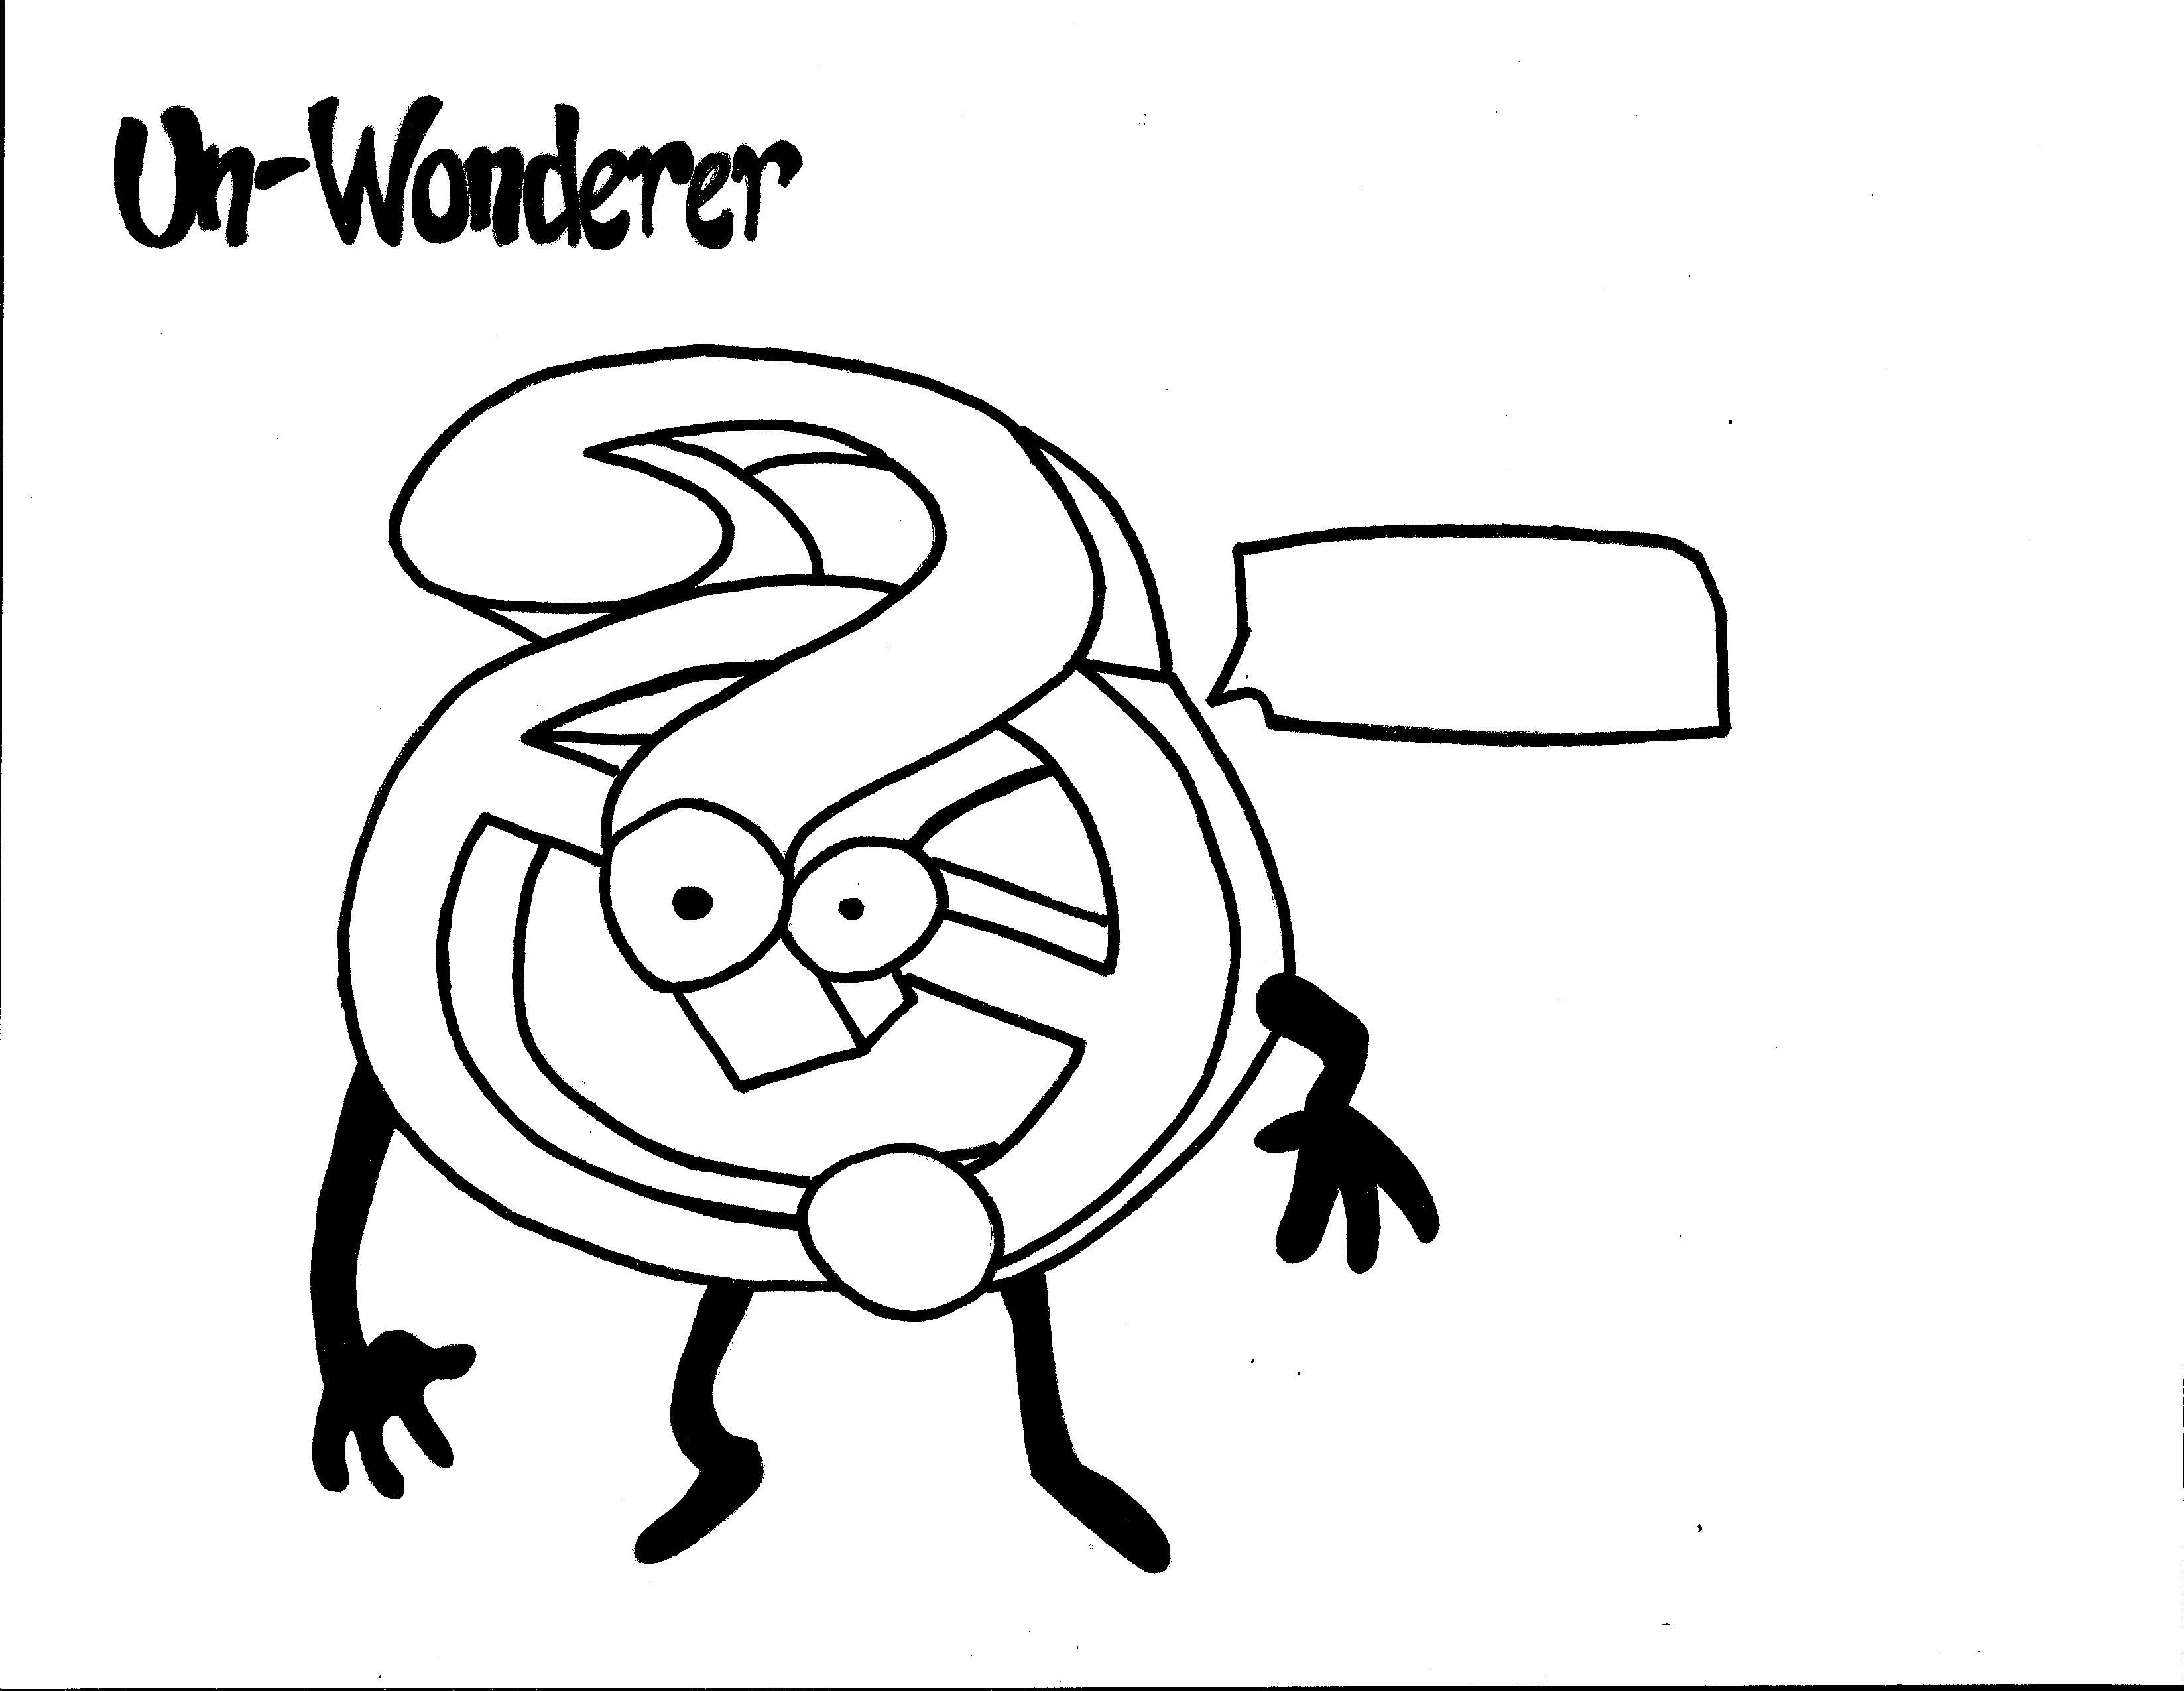 Un Wonderer Coloring Page Team Unthinkables Superflex Social Thinking